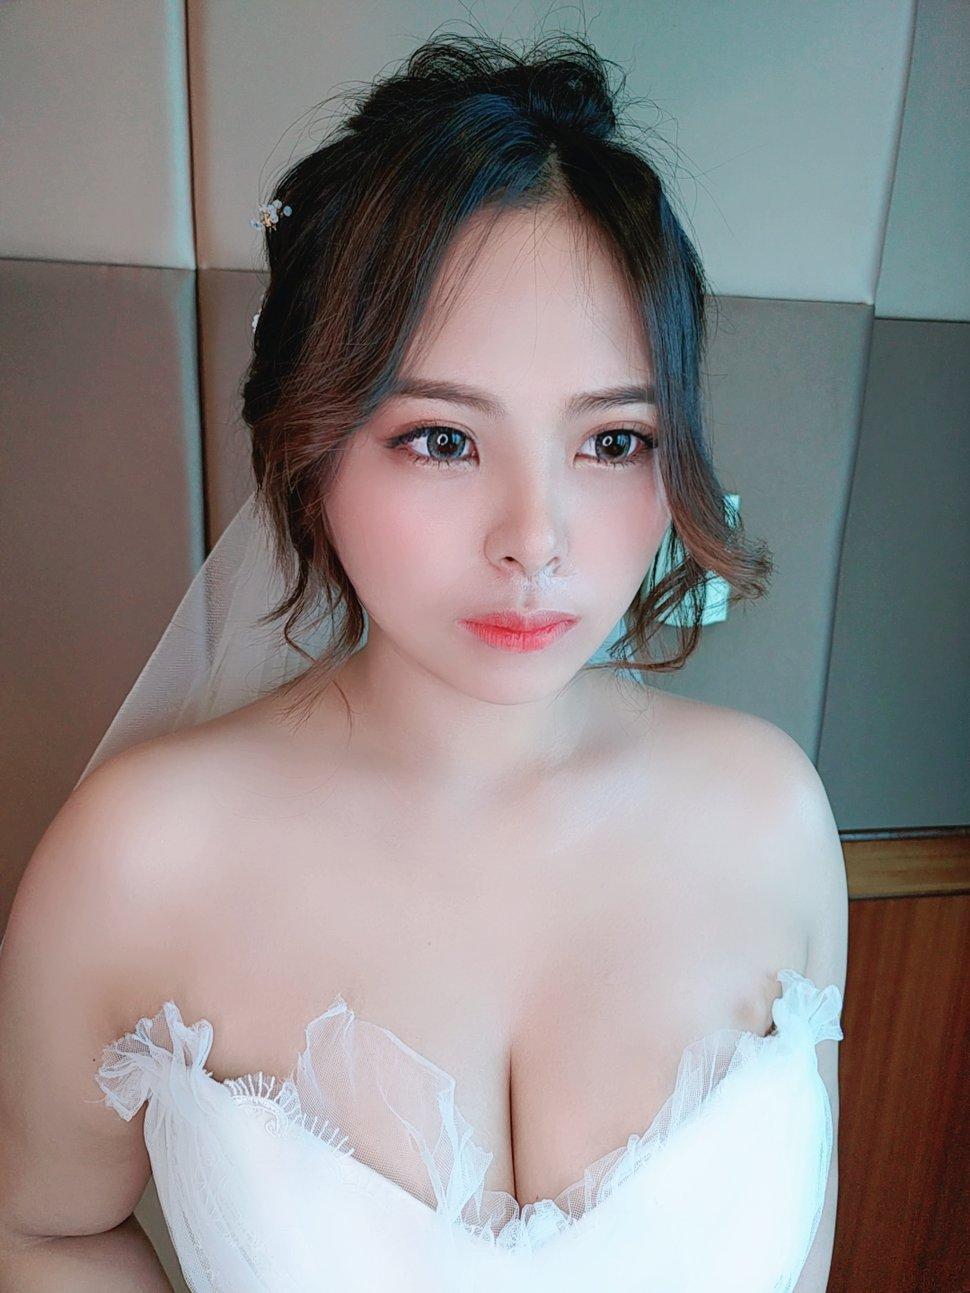 A6DE105C-7FDF-4F54-BB5E-28A0A156A91E - Nanami 張慈慈《結婚吧》